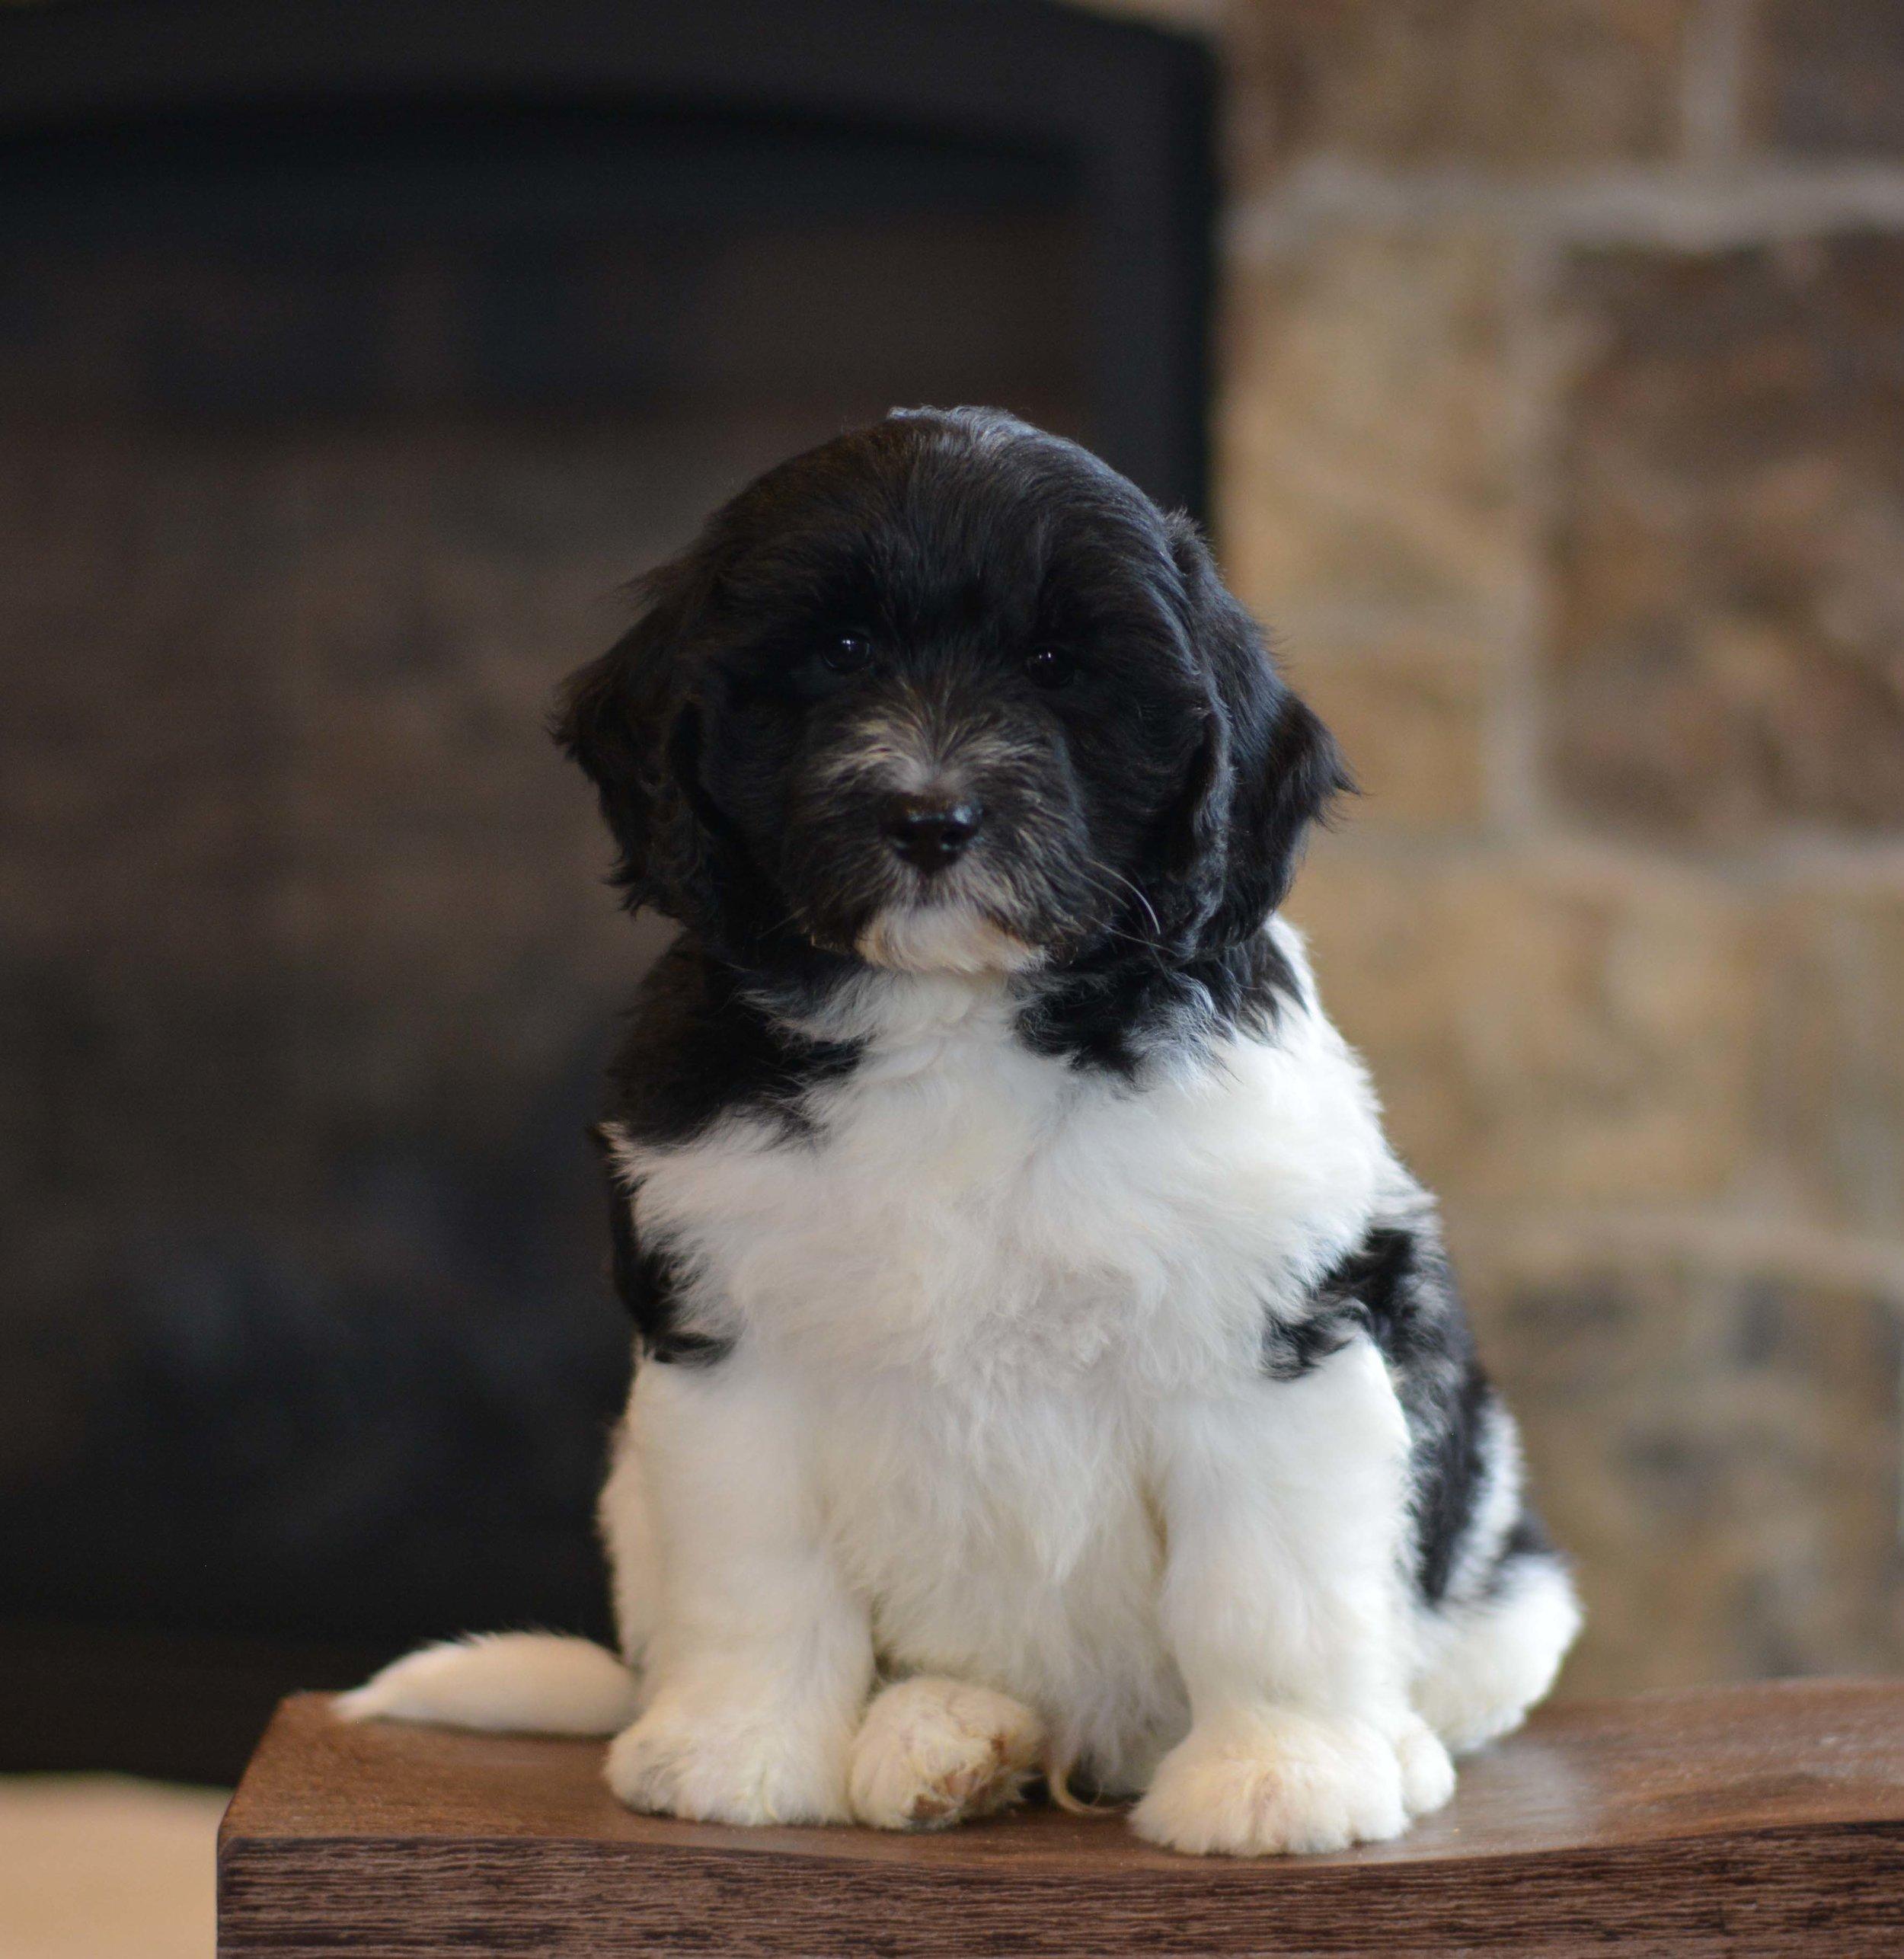 Fleecy/wavy puppy